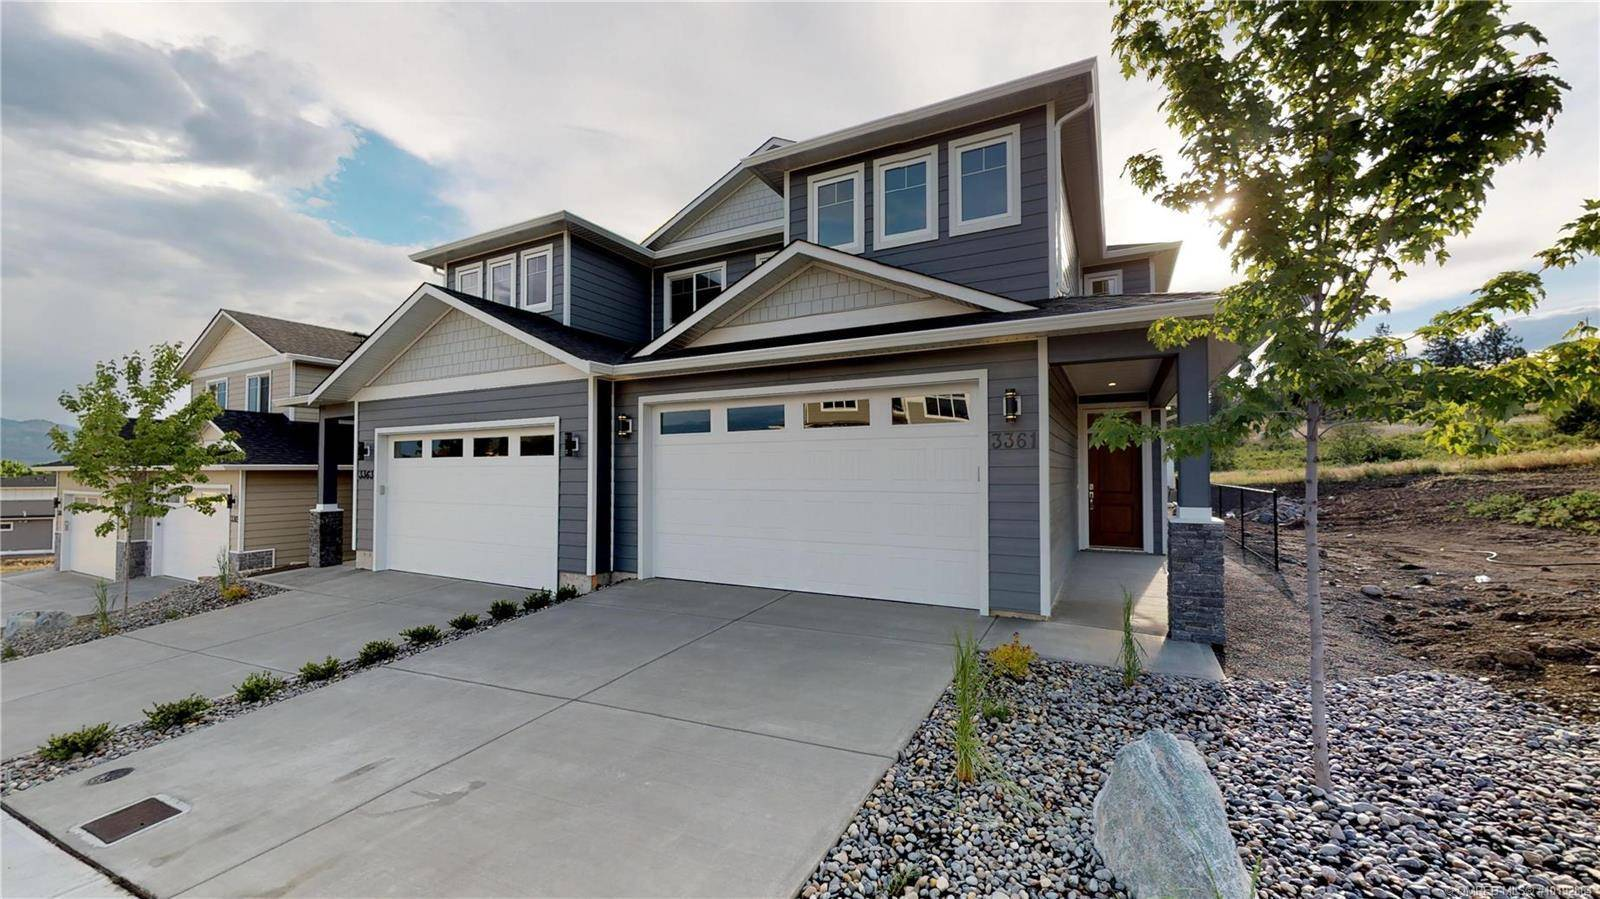 House for sale at 3370 Hawks Cres West Kelowna British Columbia - MLS: 10192864